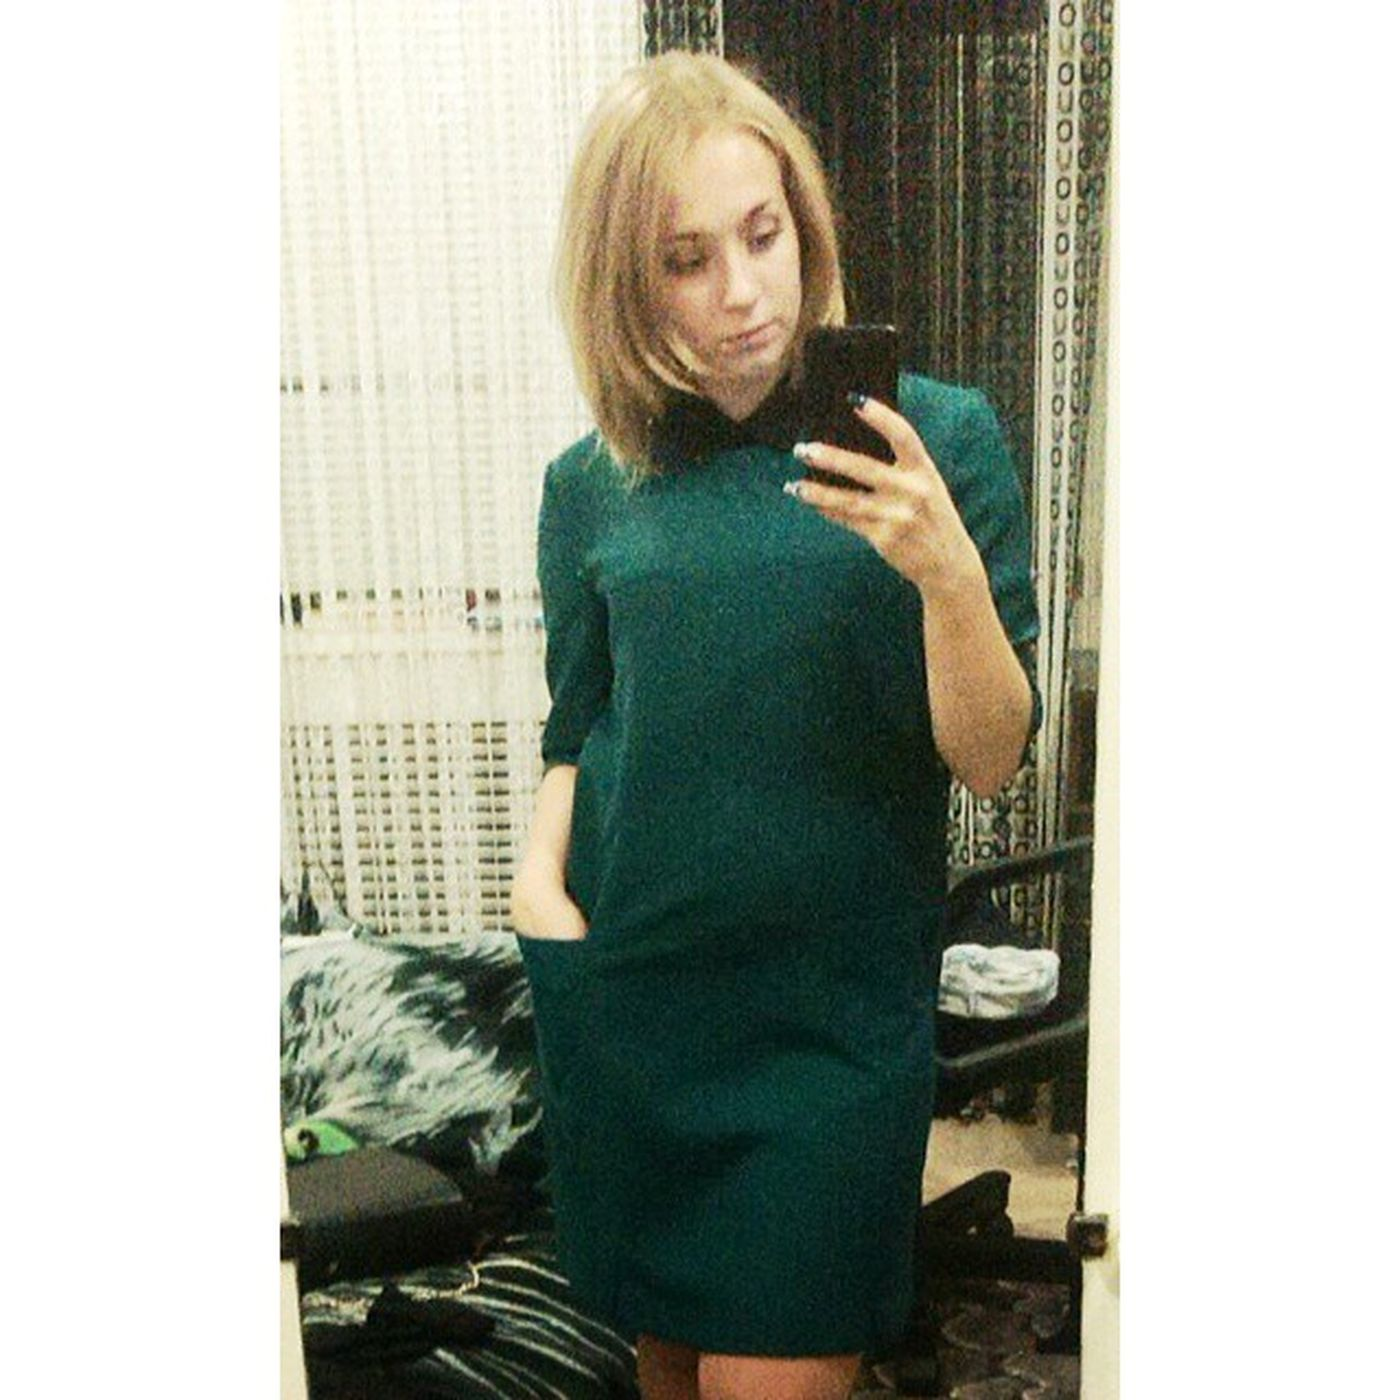 себяшка взеркале зеленое платье ???